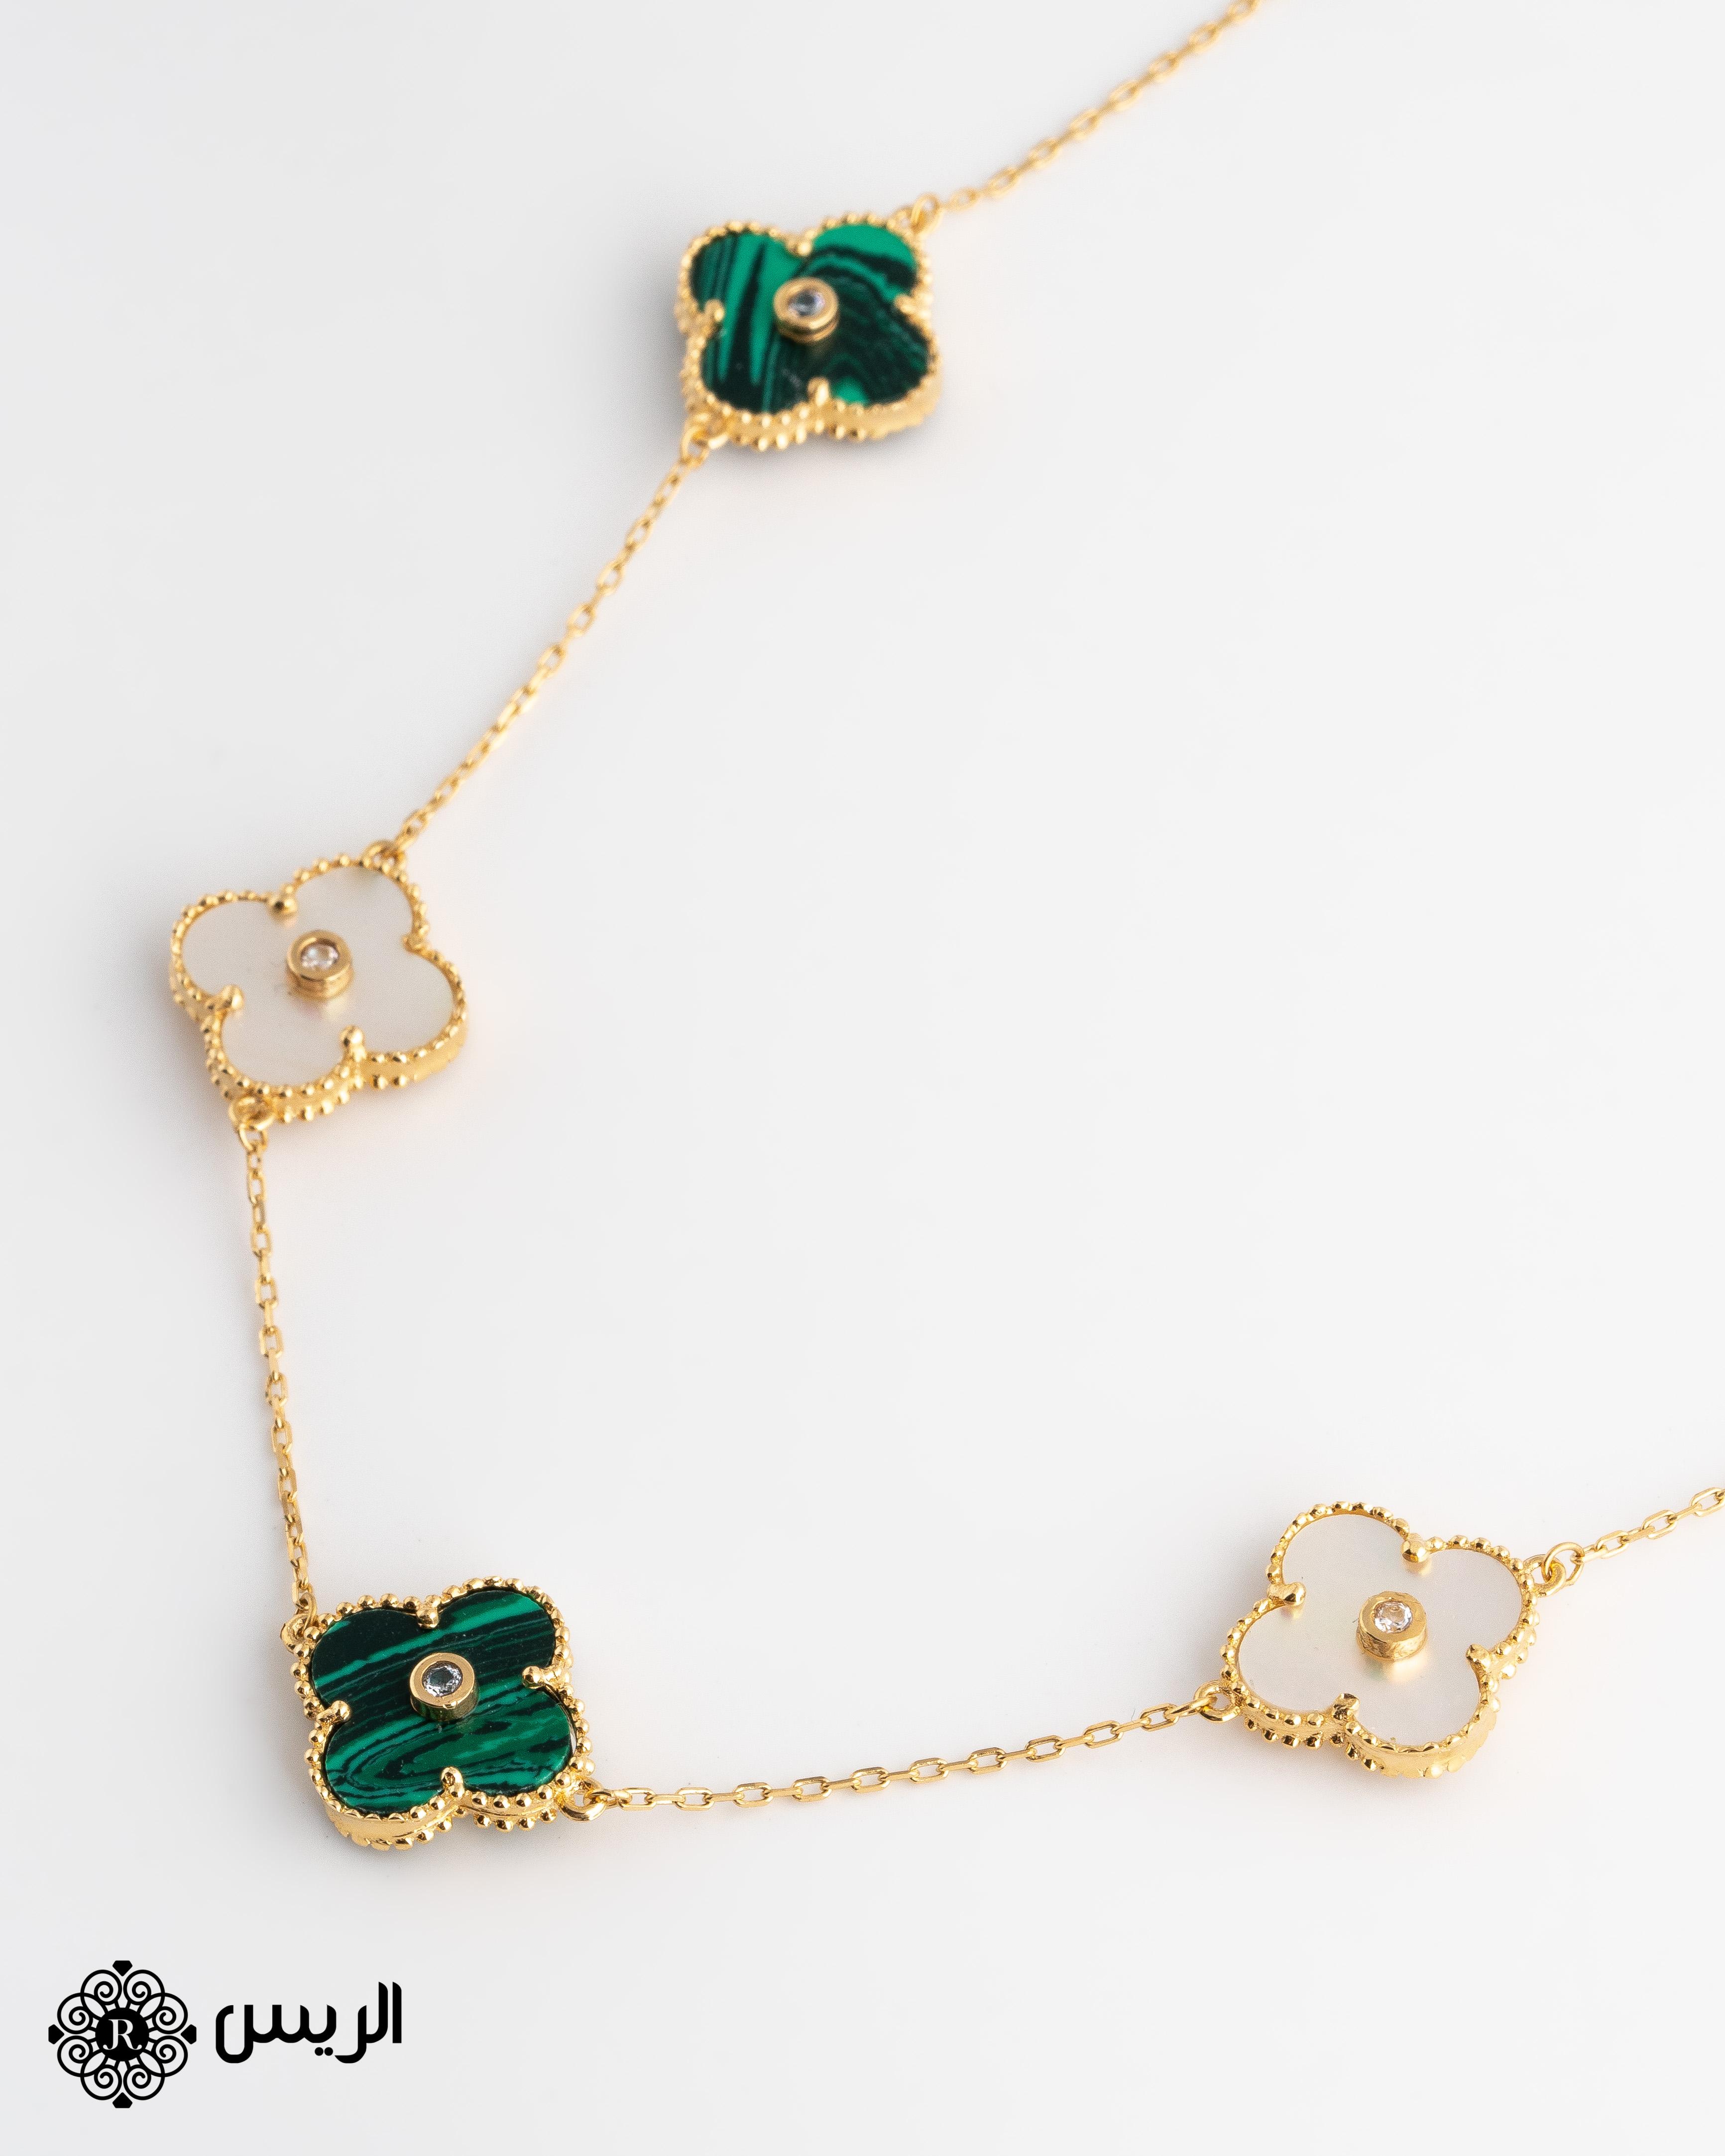 Raies jewelry Short Necklace 5 Flowers عقد قصير بـ5 وردات الريس للمجوهرات